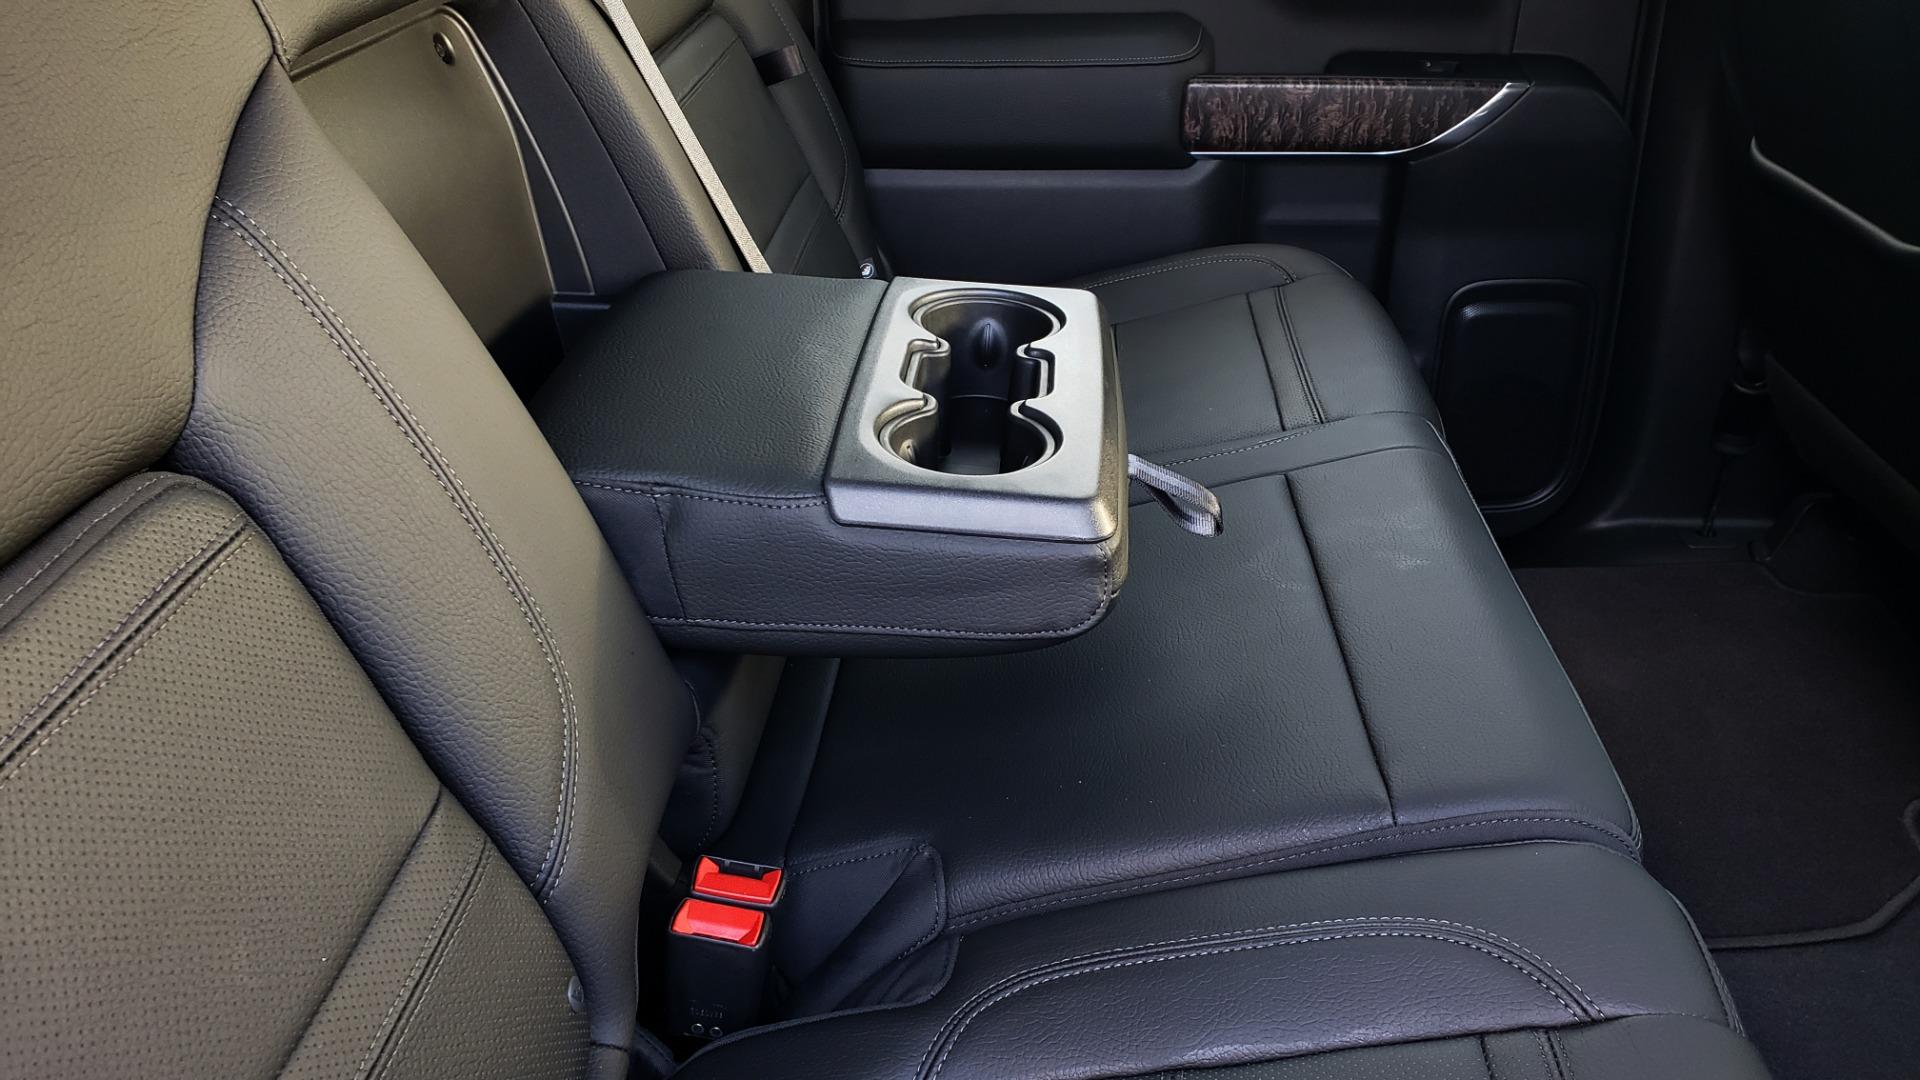 Used 2019 GMC SIERRA 1500 DENALI ULTIMATE 4WD / NAV / TECH PKG / DRVR ALRT for sale Sold at Formula Imports in Charlotte NC 28227 79